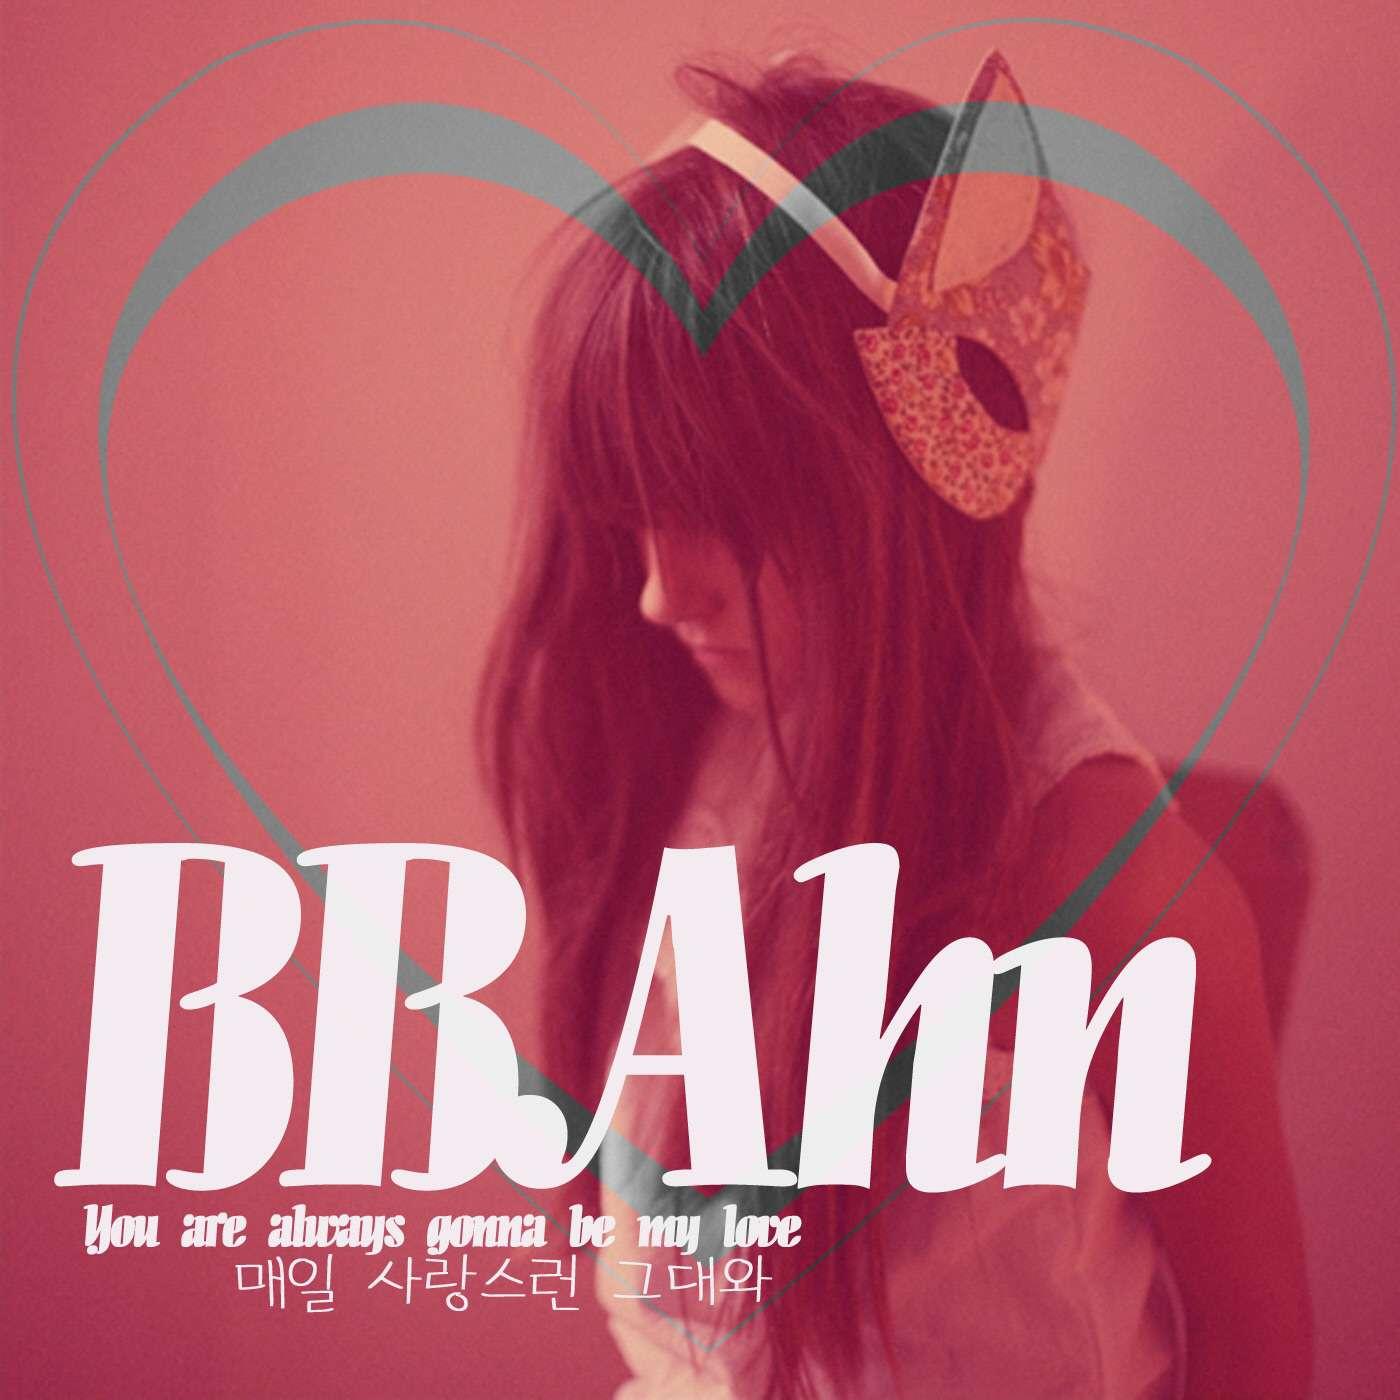 [Single] BBAhn - 매일 사랑스런 그대와